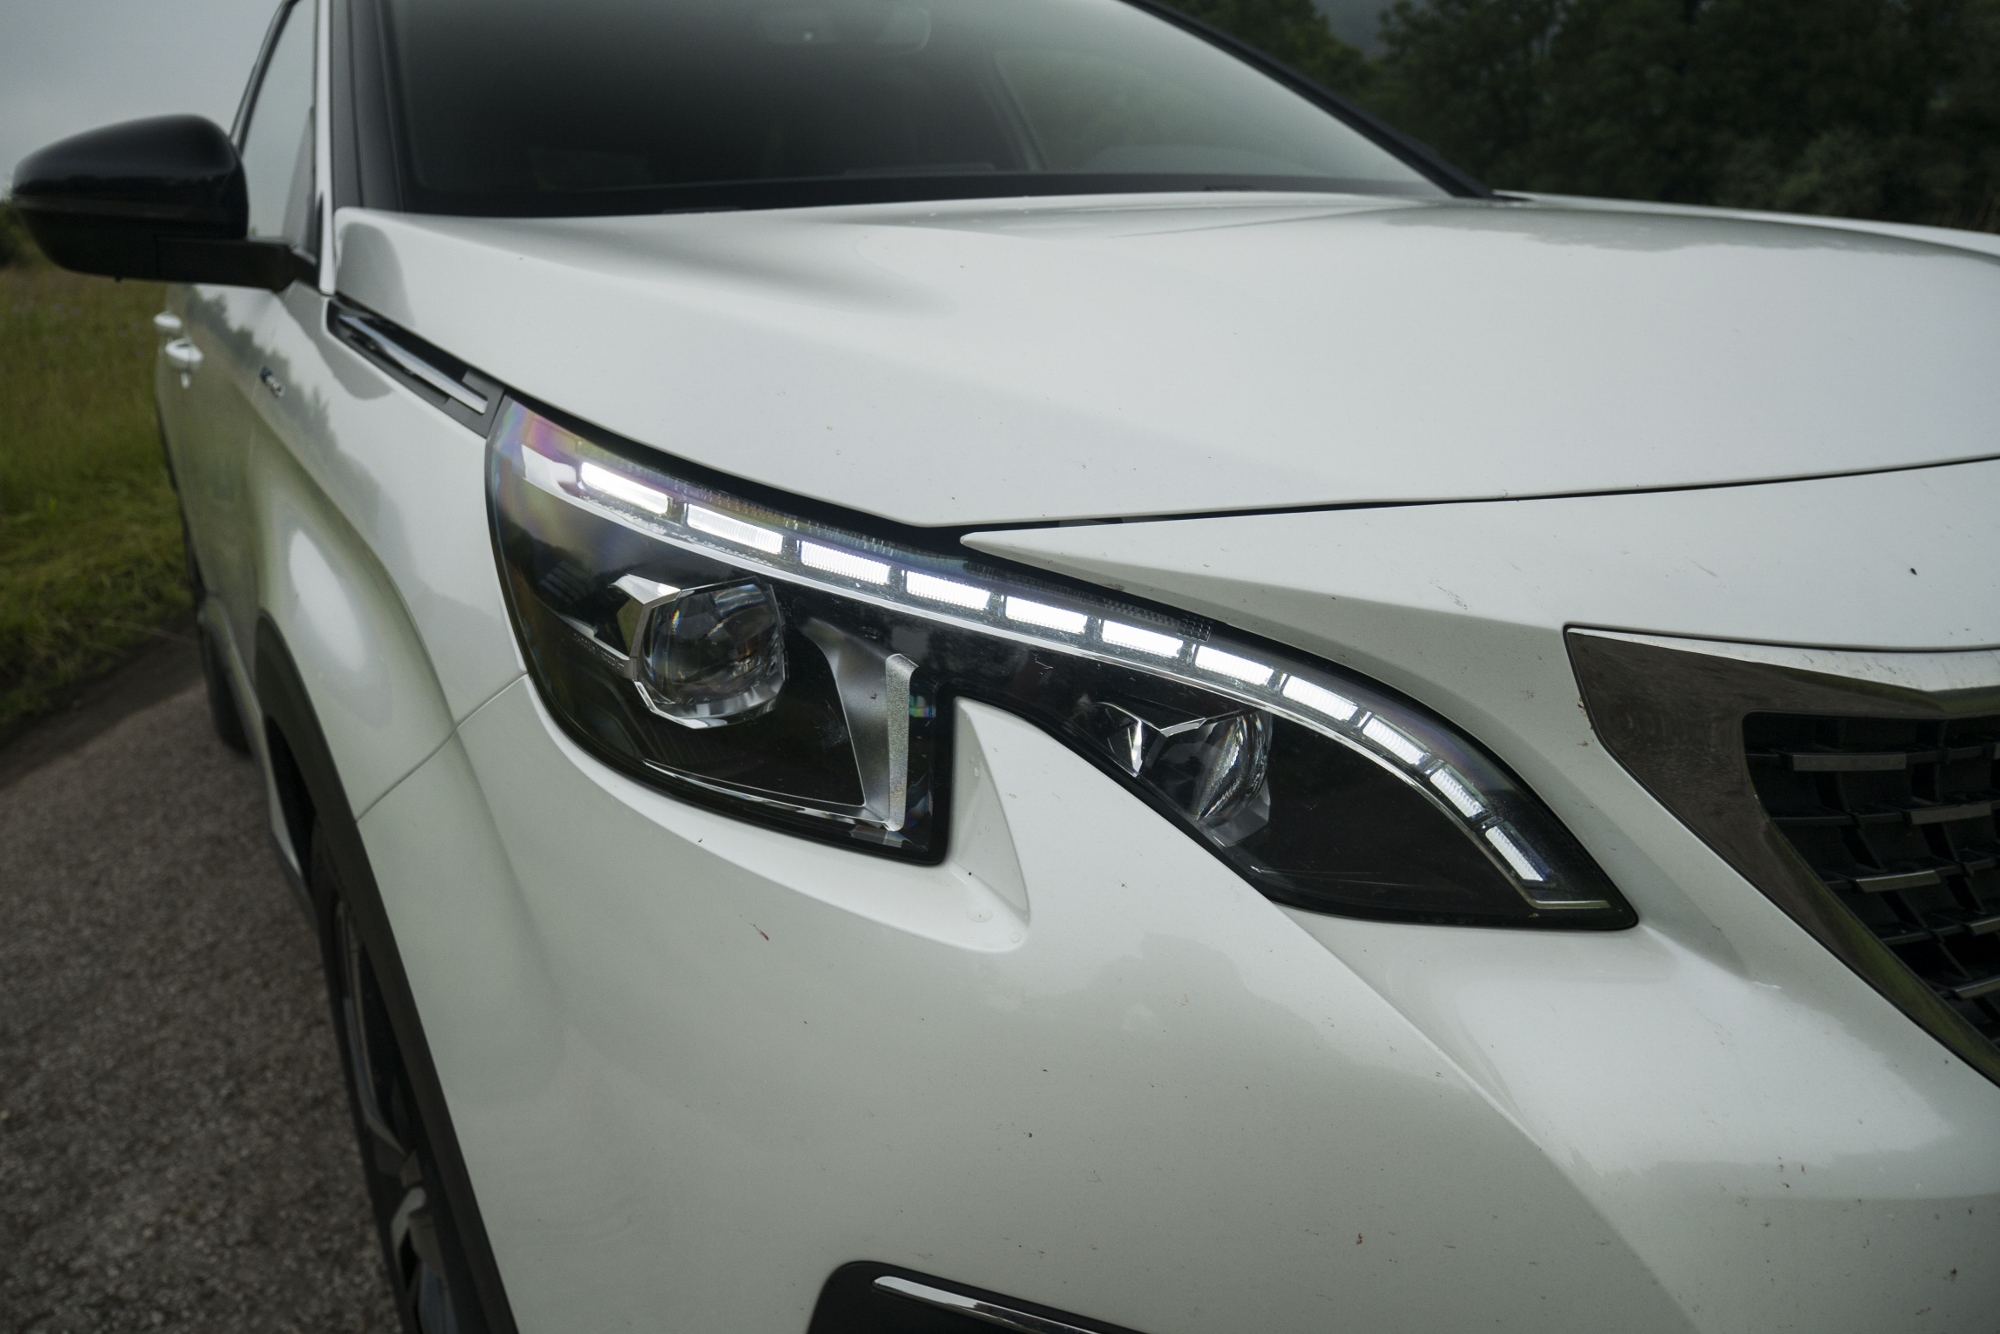 Test: Peugeot 3008 posúva schopnosti plug in hybridov I1NVdzz2og peugeot-3008-hybrid4-3